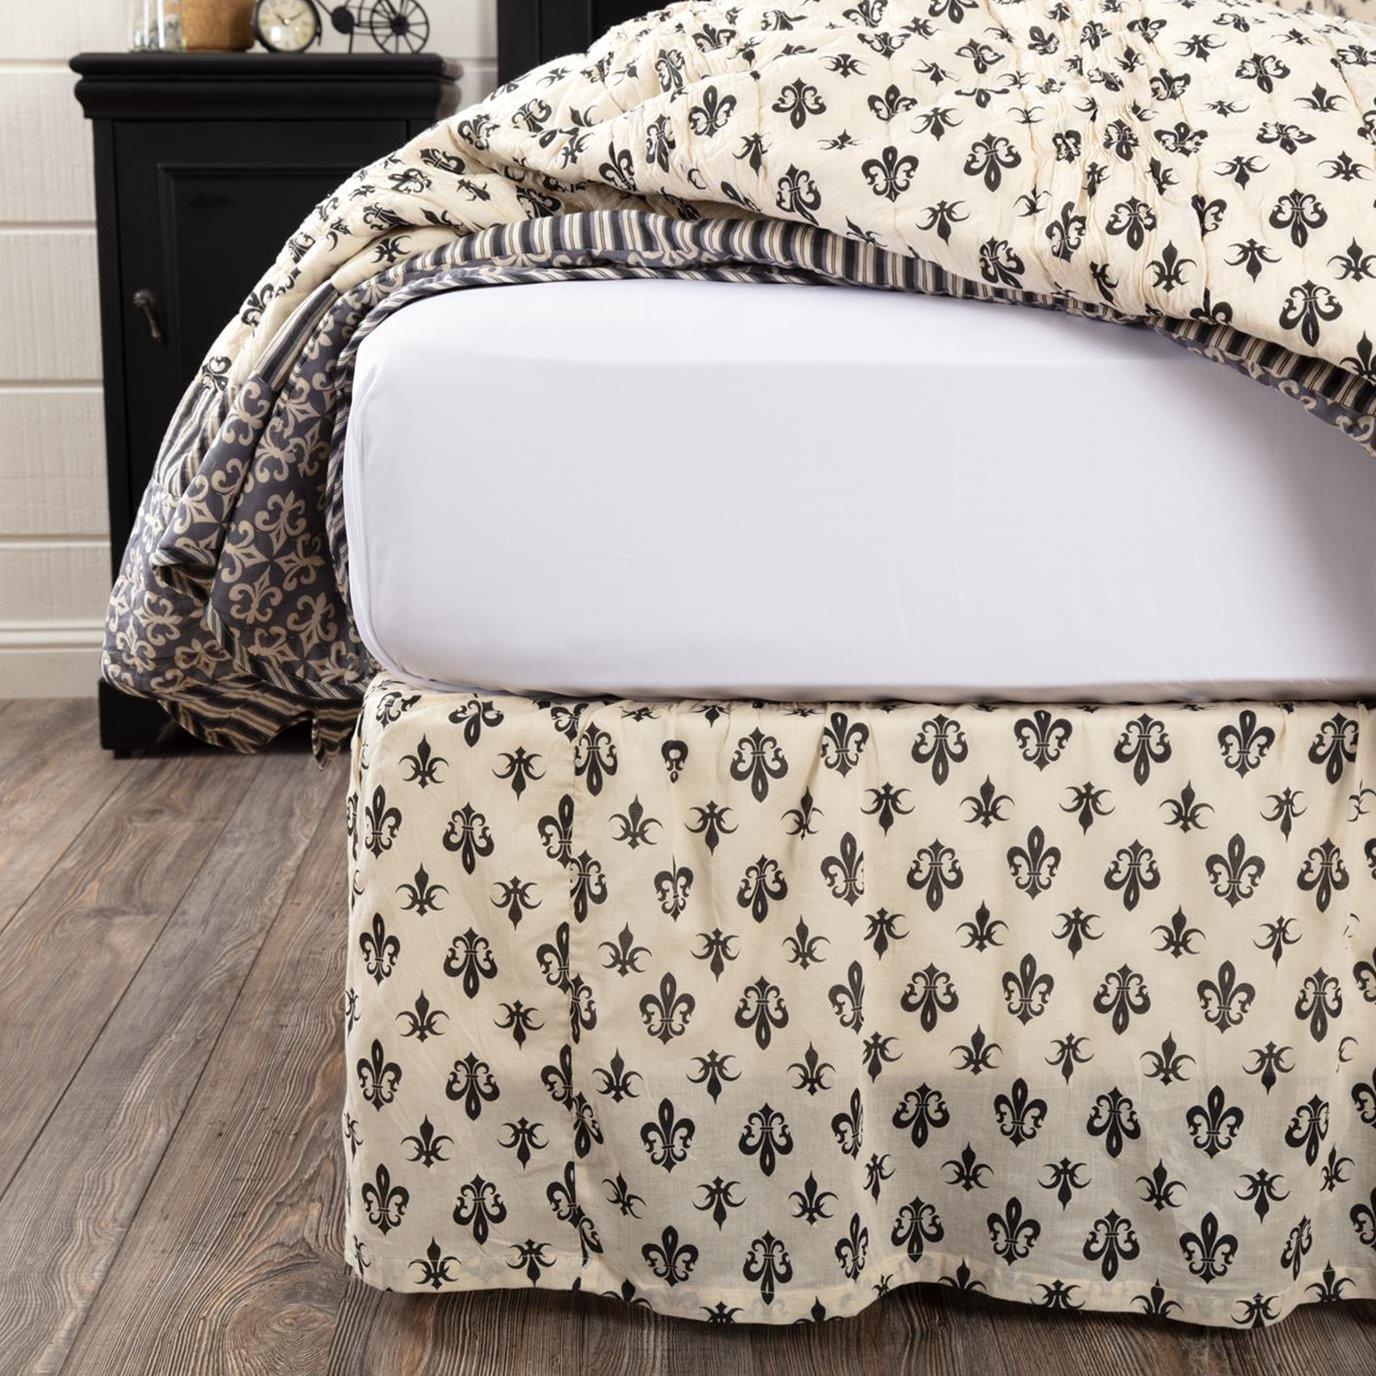 Elysee Queen Bed Skirt 60x80x16